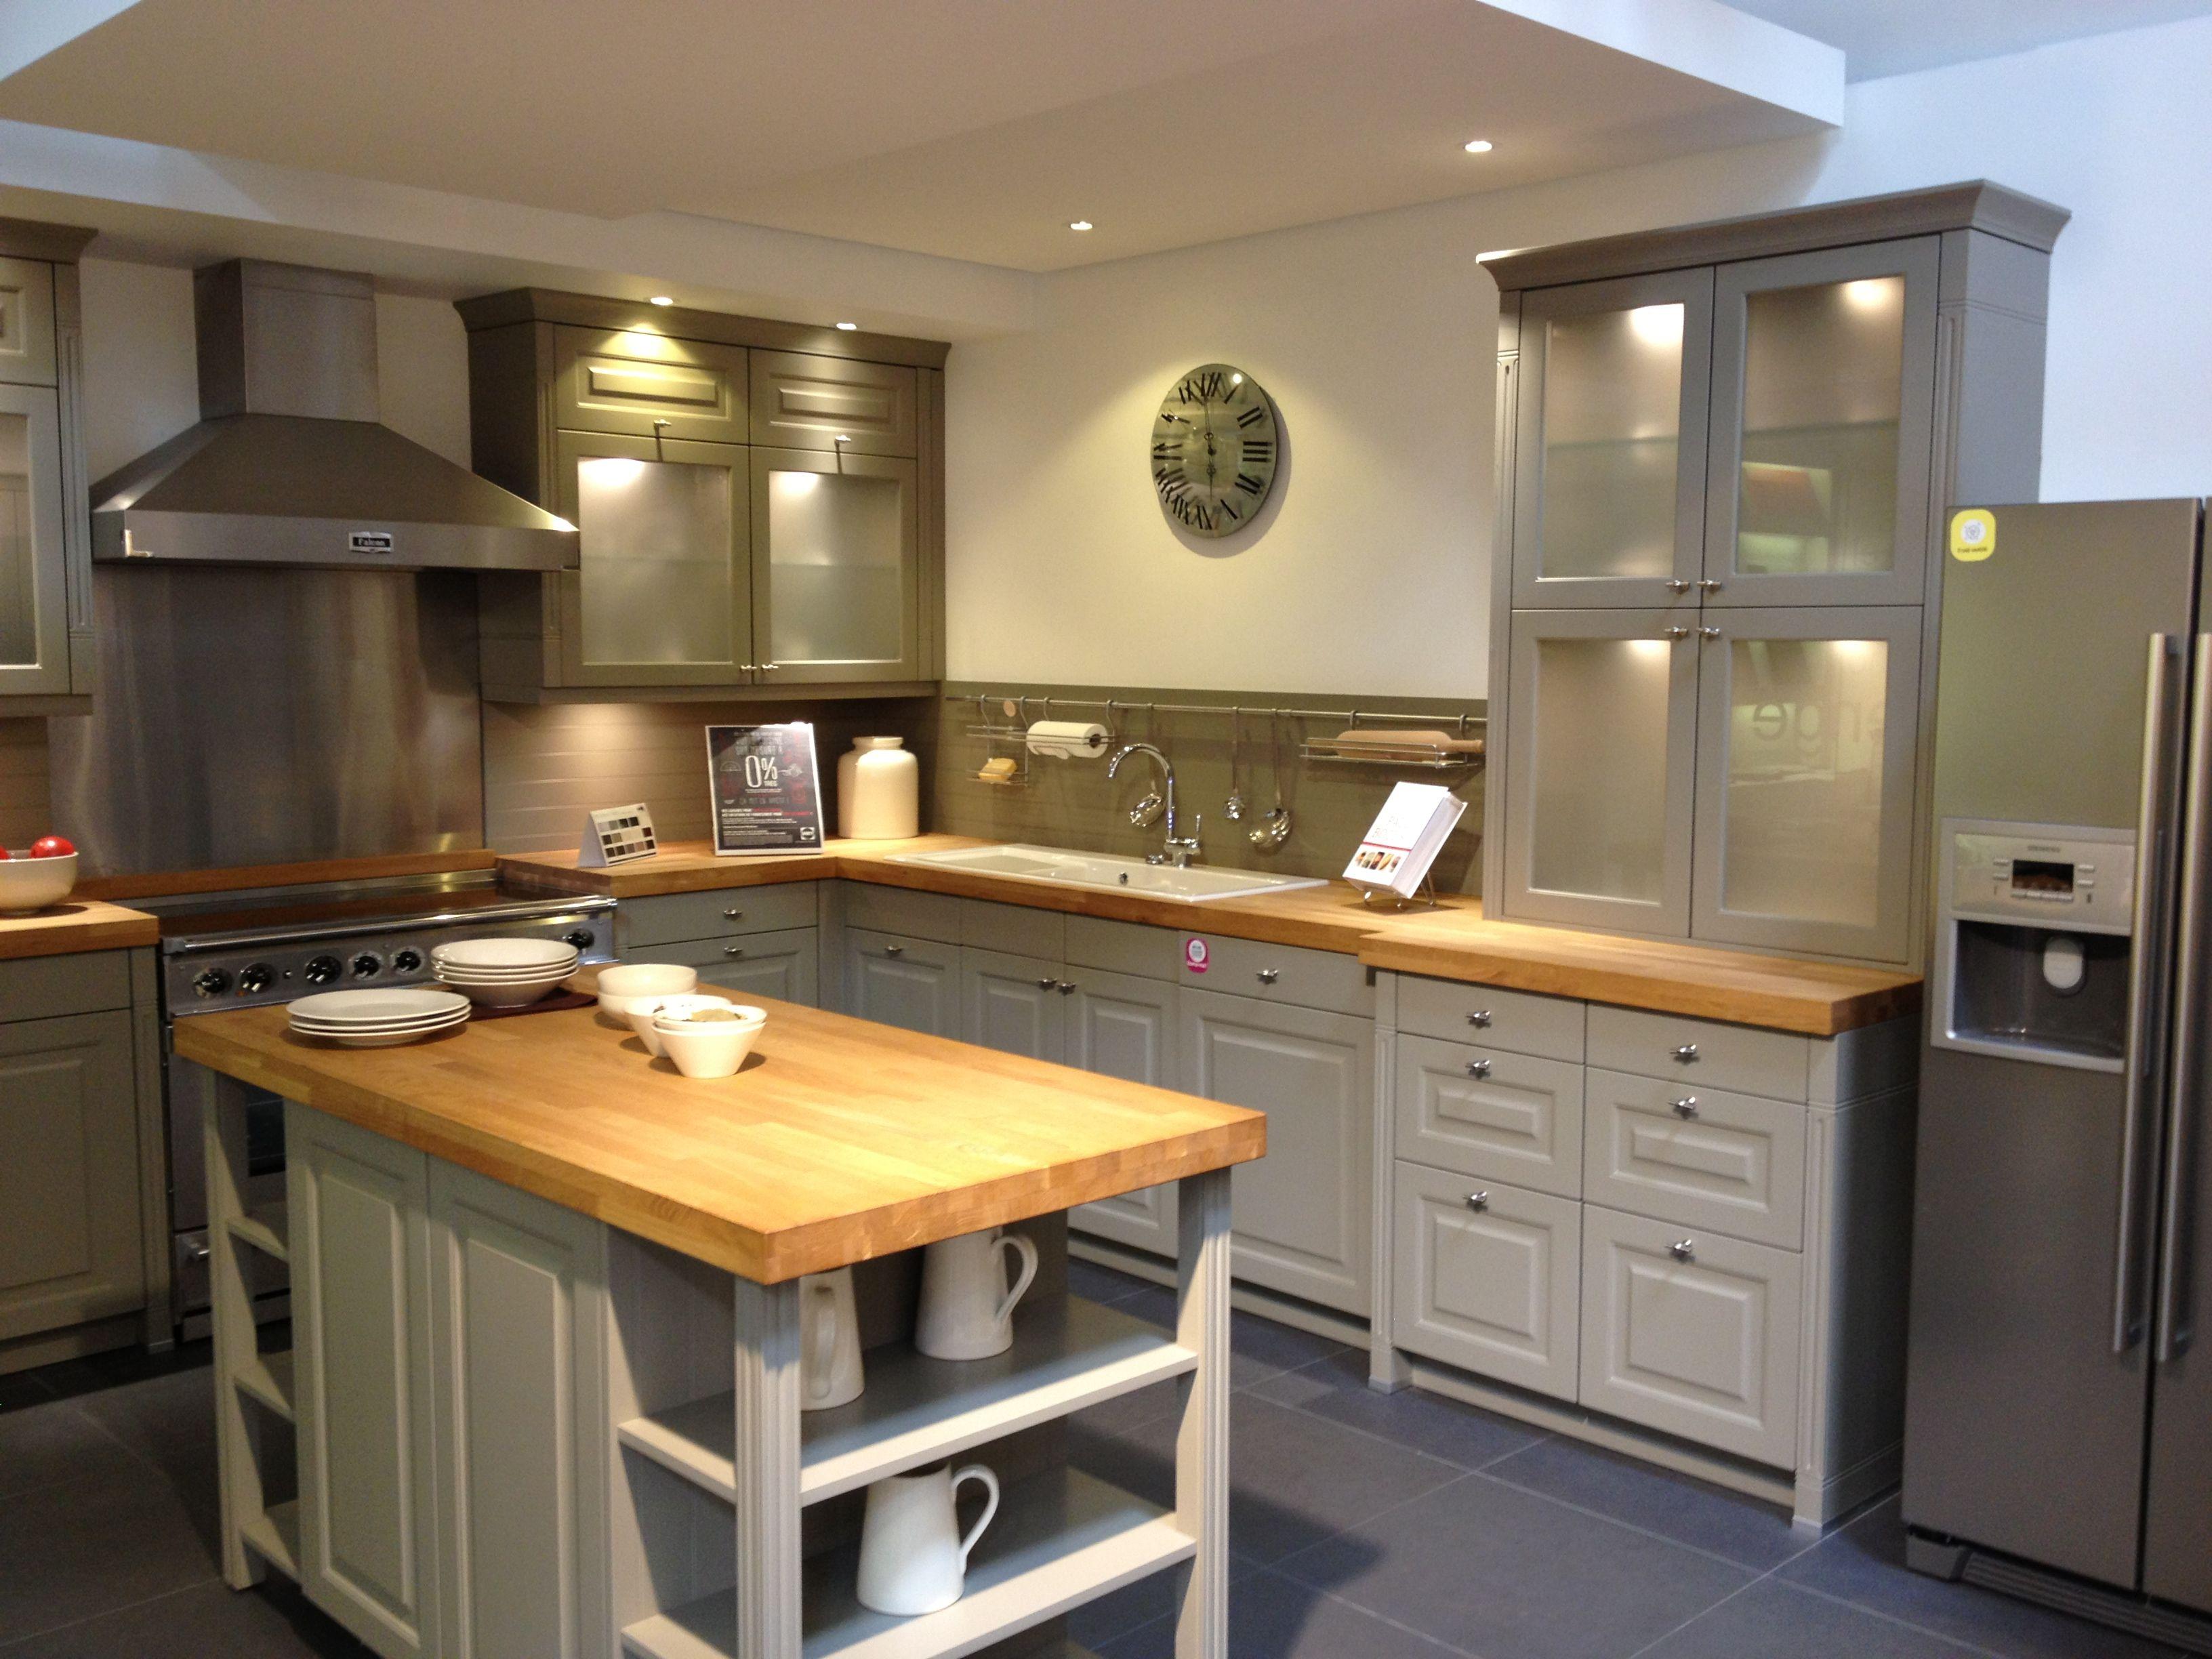 cuisine by darty cuisine pinterest utah. Black Bedroom Furniture Sets. Home Design Ideas